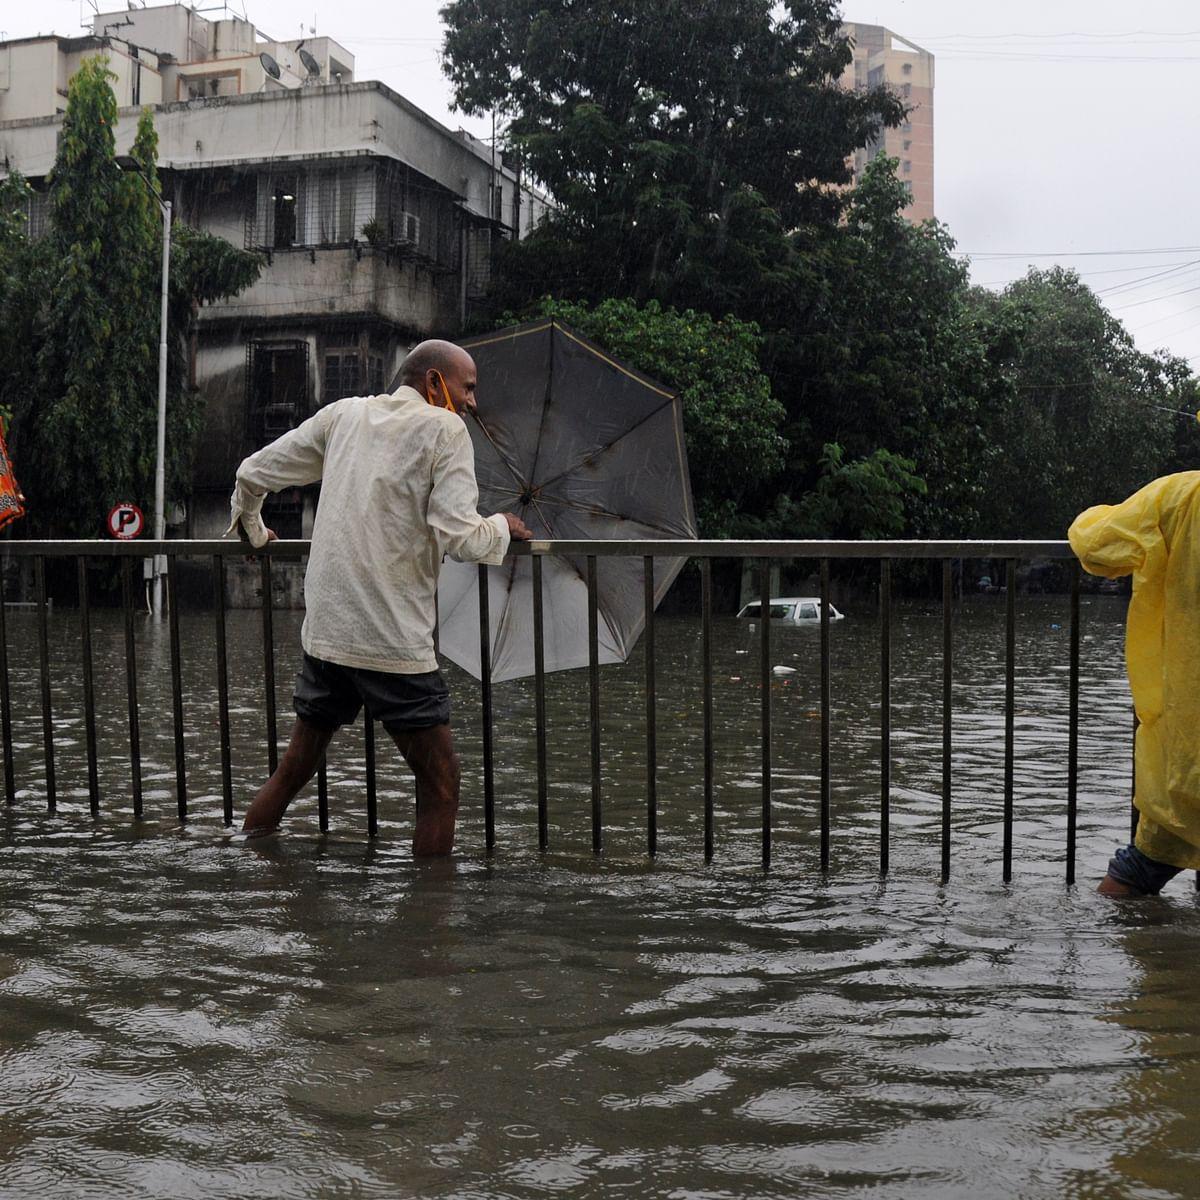 (Photo by Ashish Vaishnav/SOPA Images/LightRocket via Getty Images)